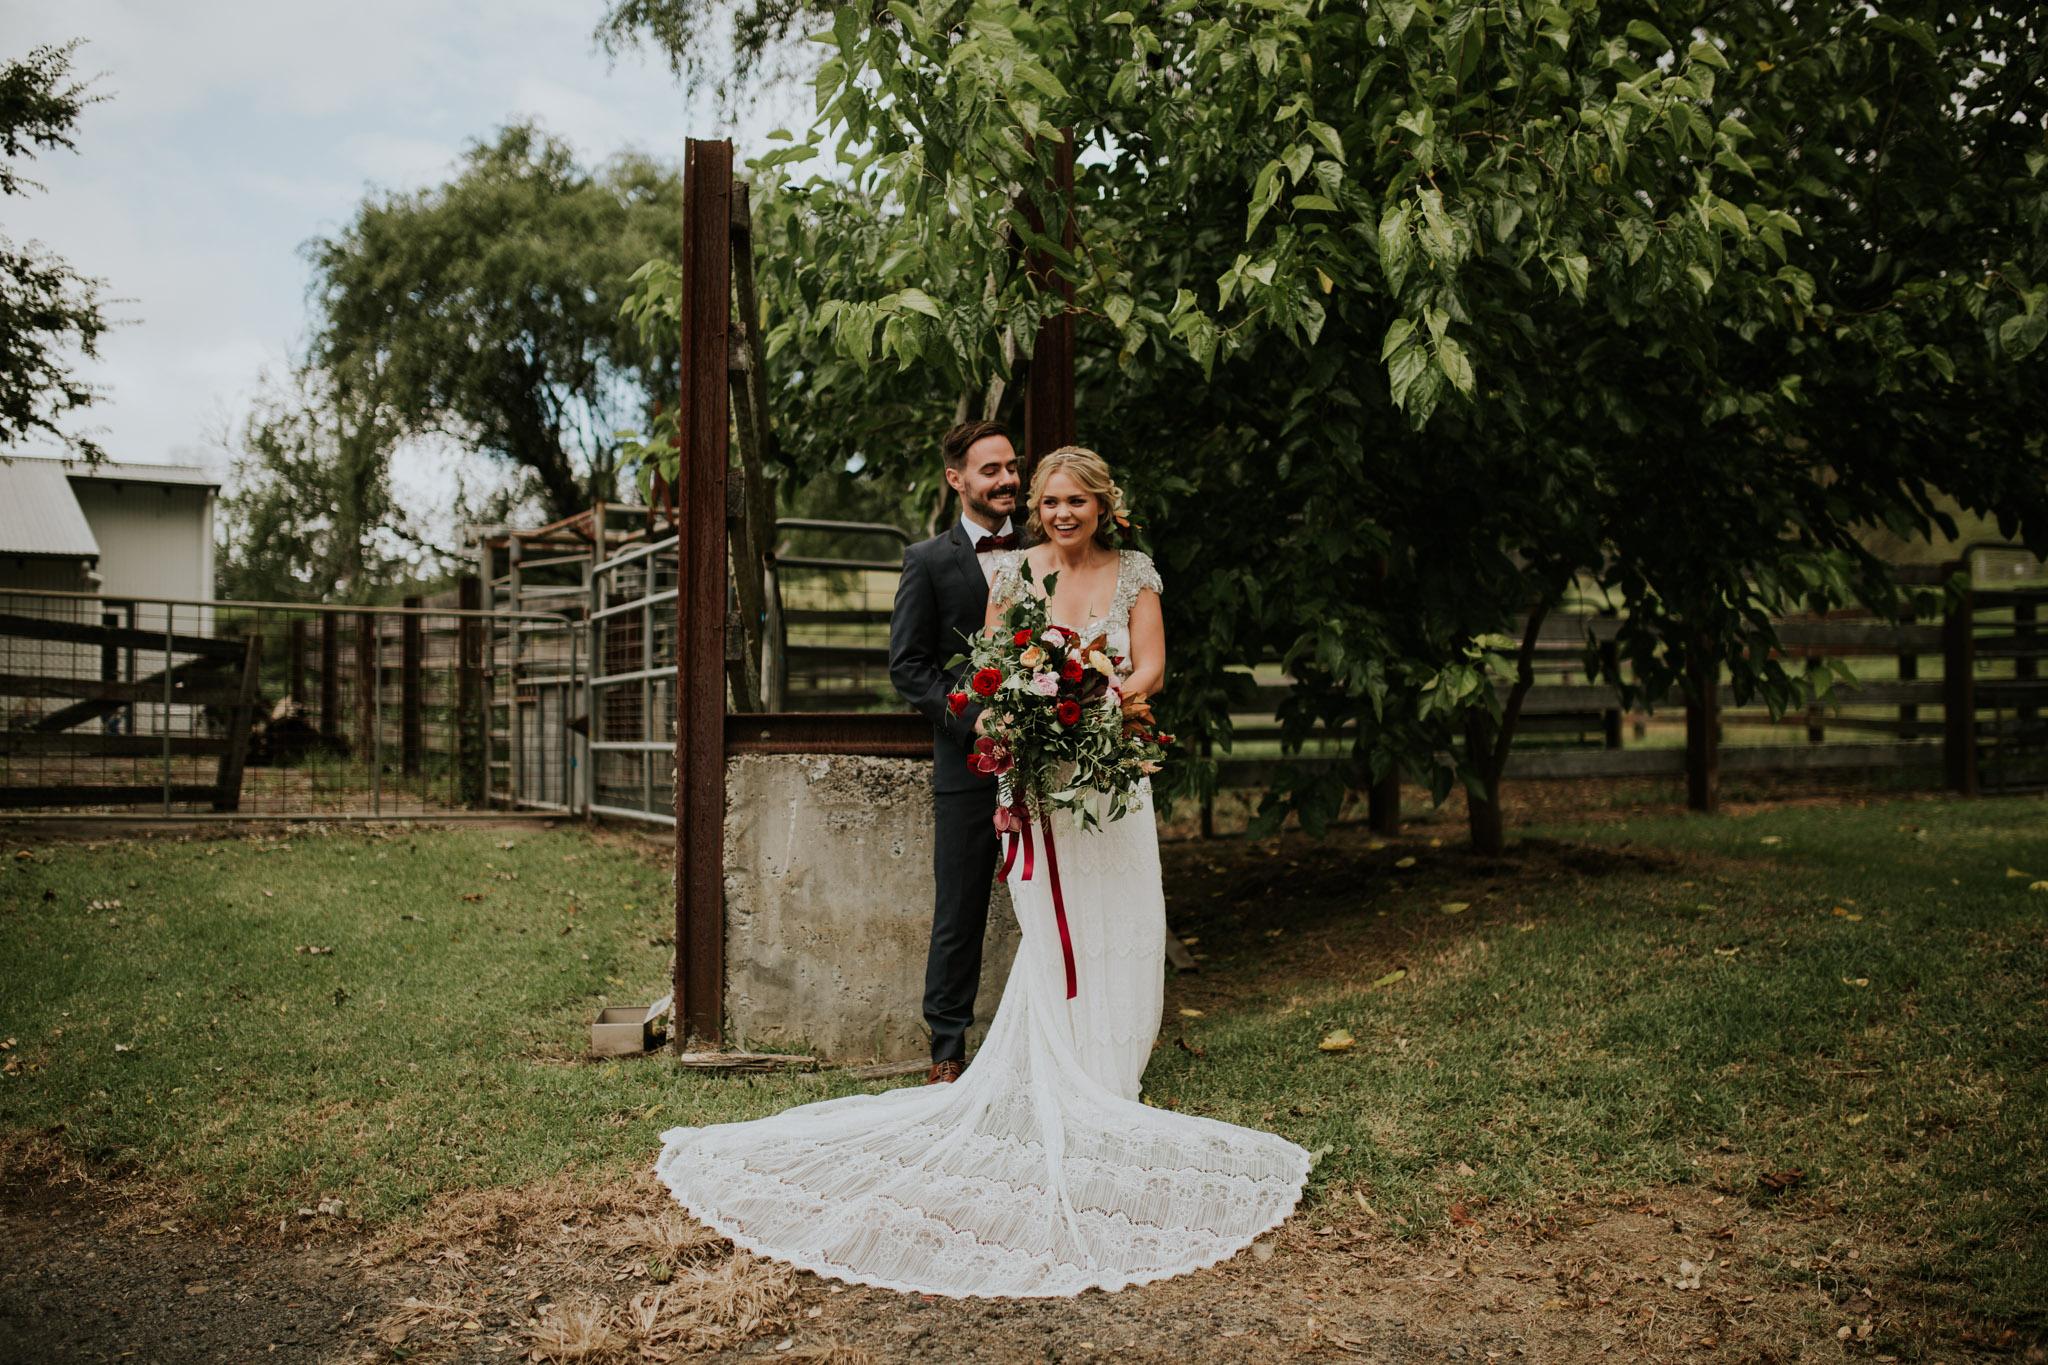 SPRING-GROVE-DAIRY-WEDDING-58.jpg